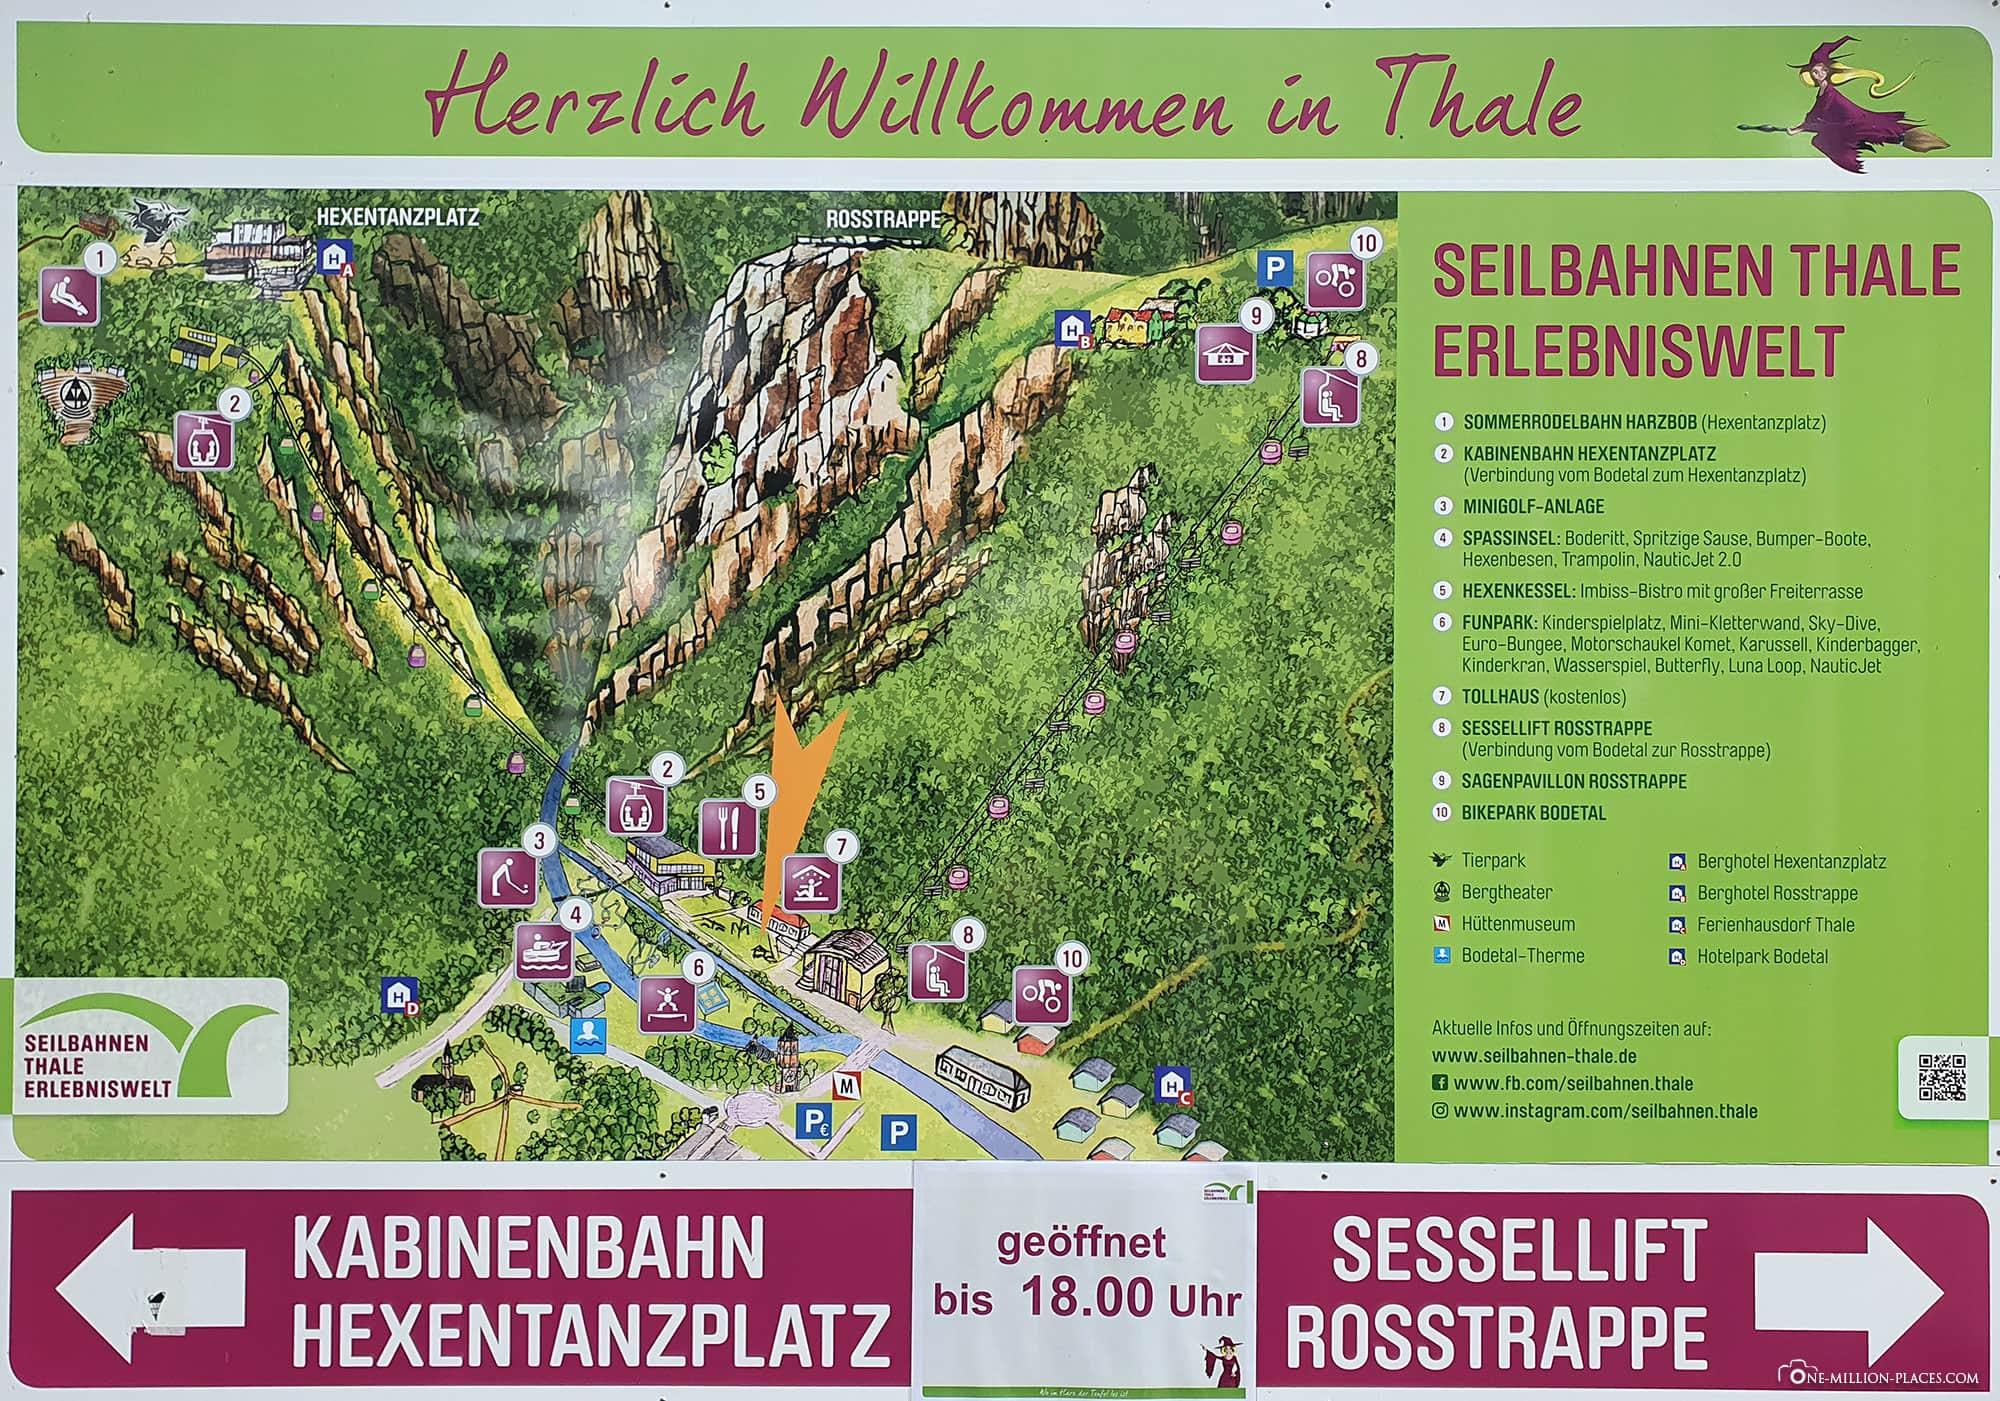 Map, Plan, Adventure World Thale, Bodetal, Travelreport, Saxony-Anhalt, Germany, Blog